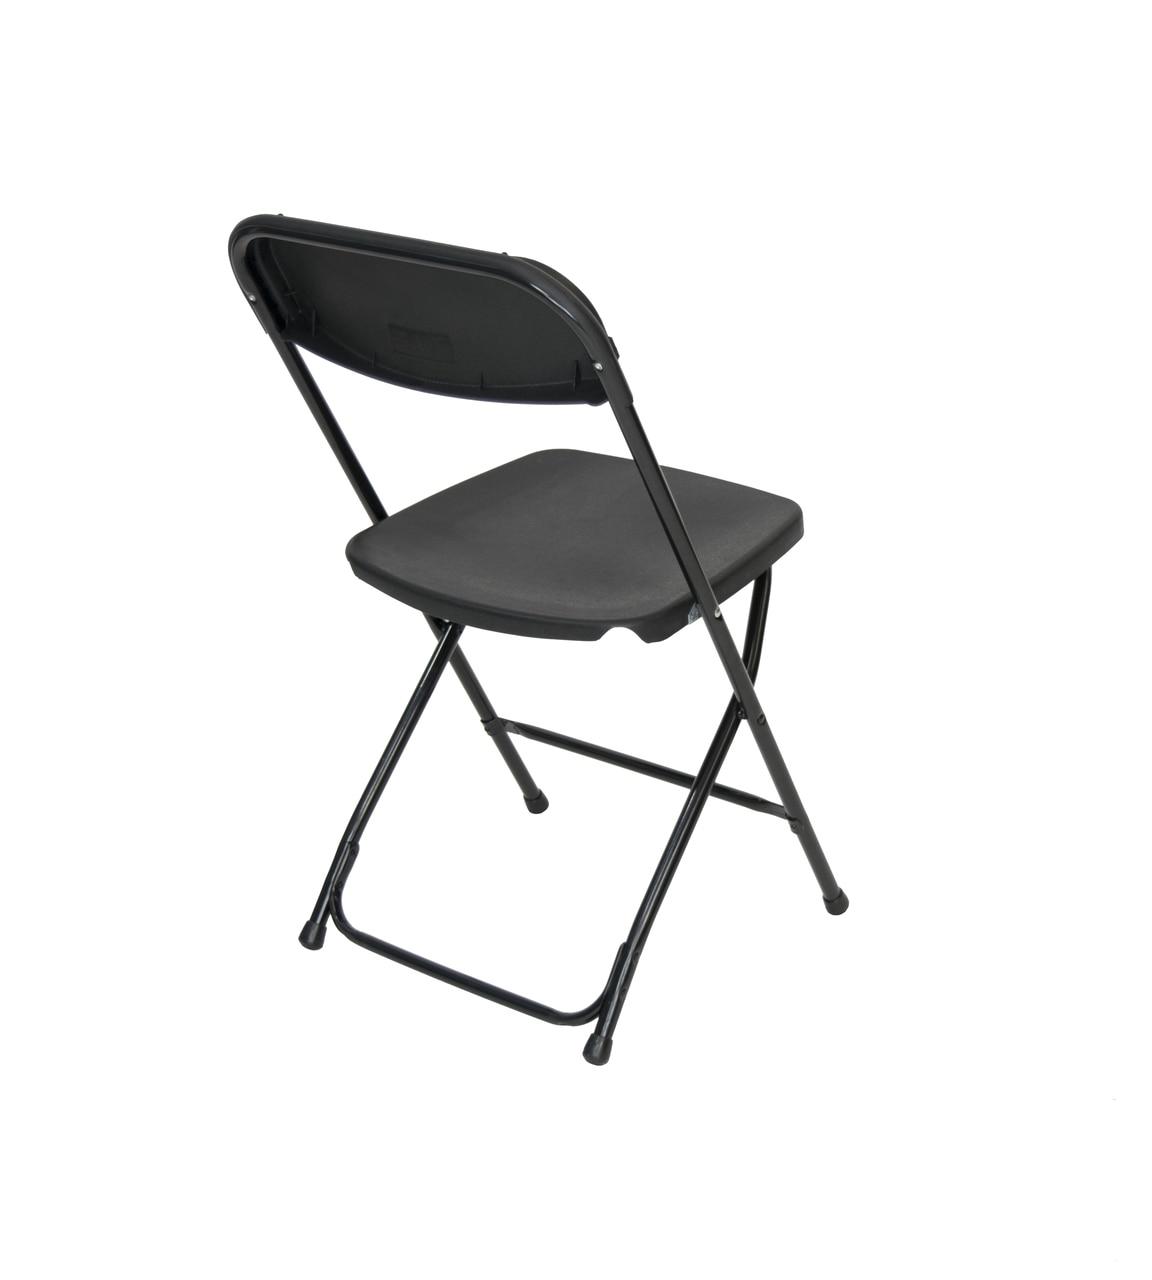 Cloth Padded Folding Chairs Black Plastic Folding Chair Premium Rental Style